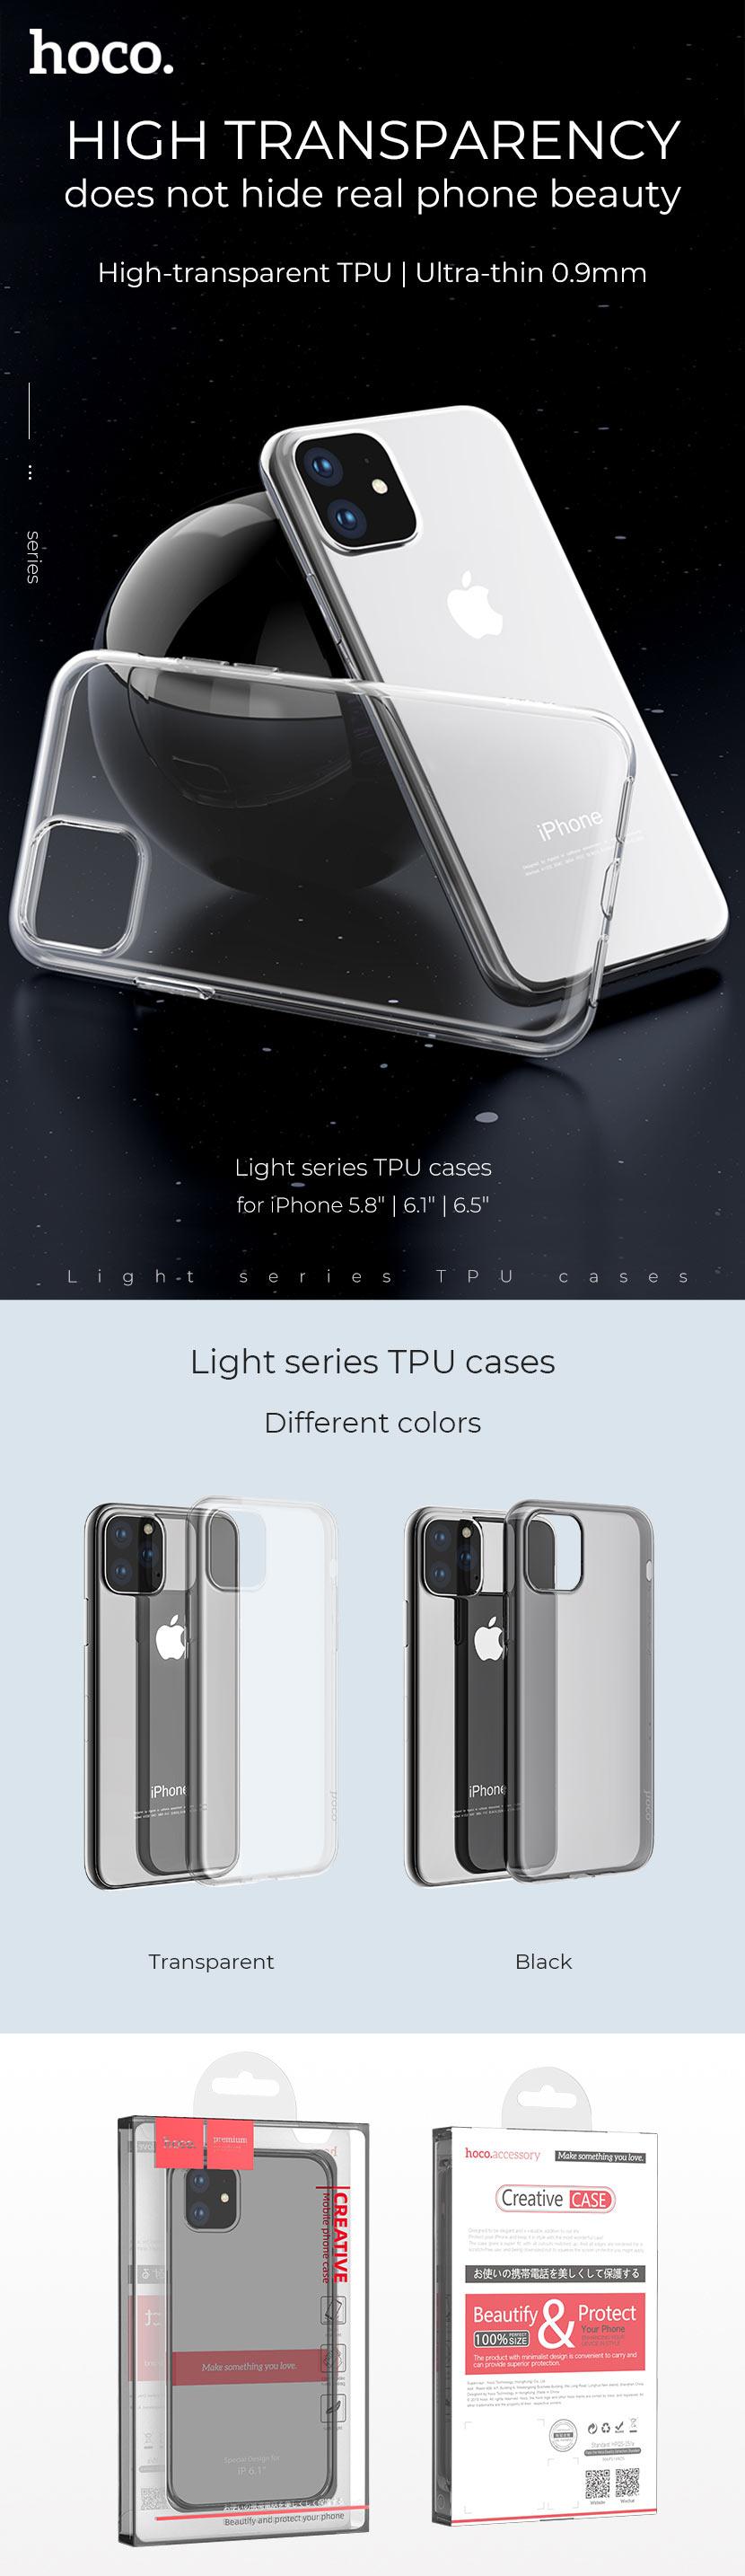 hoco news 2019 iphone case collection light series en